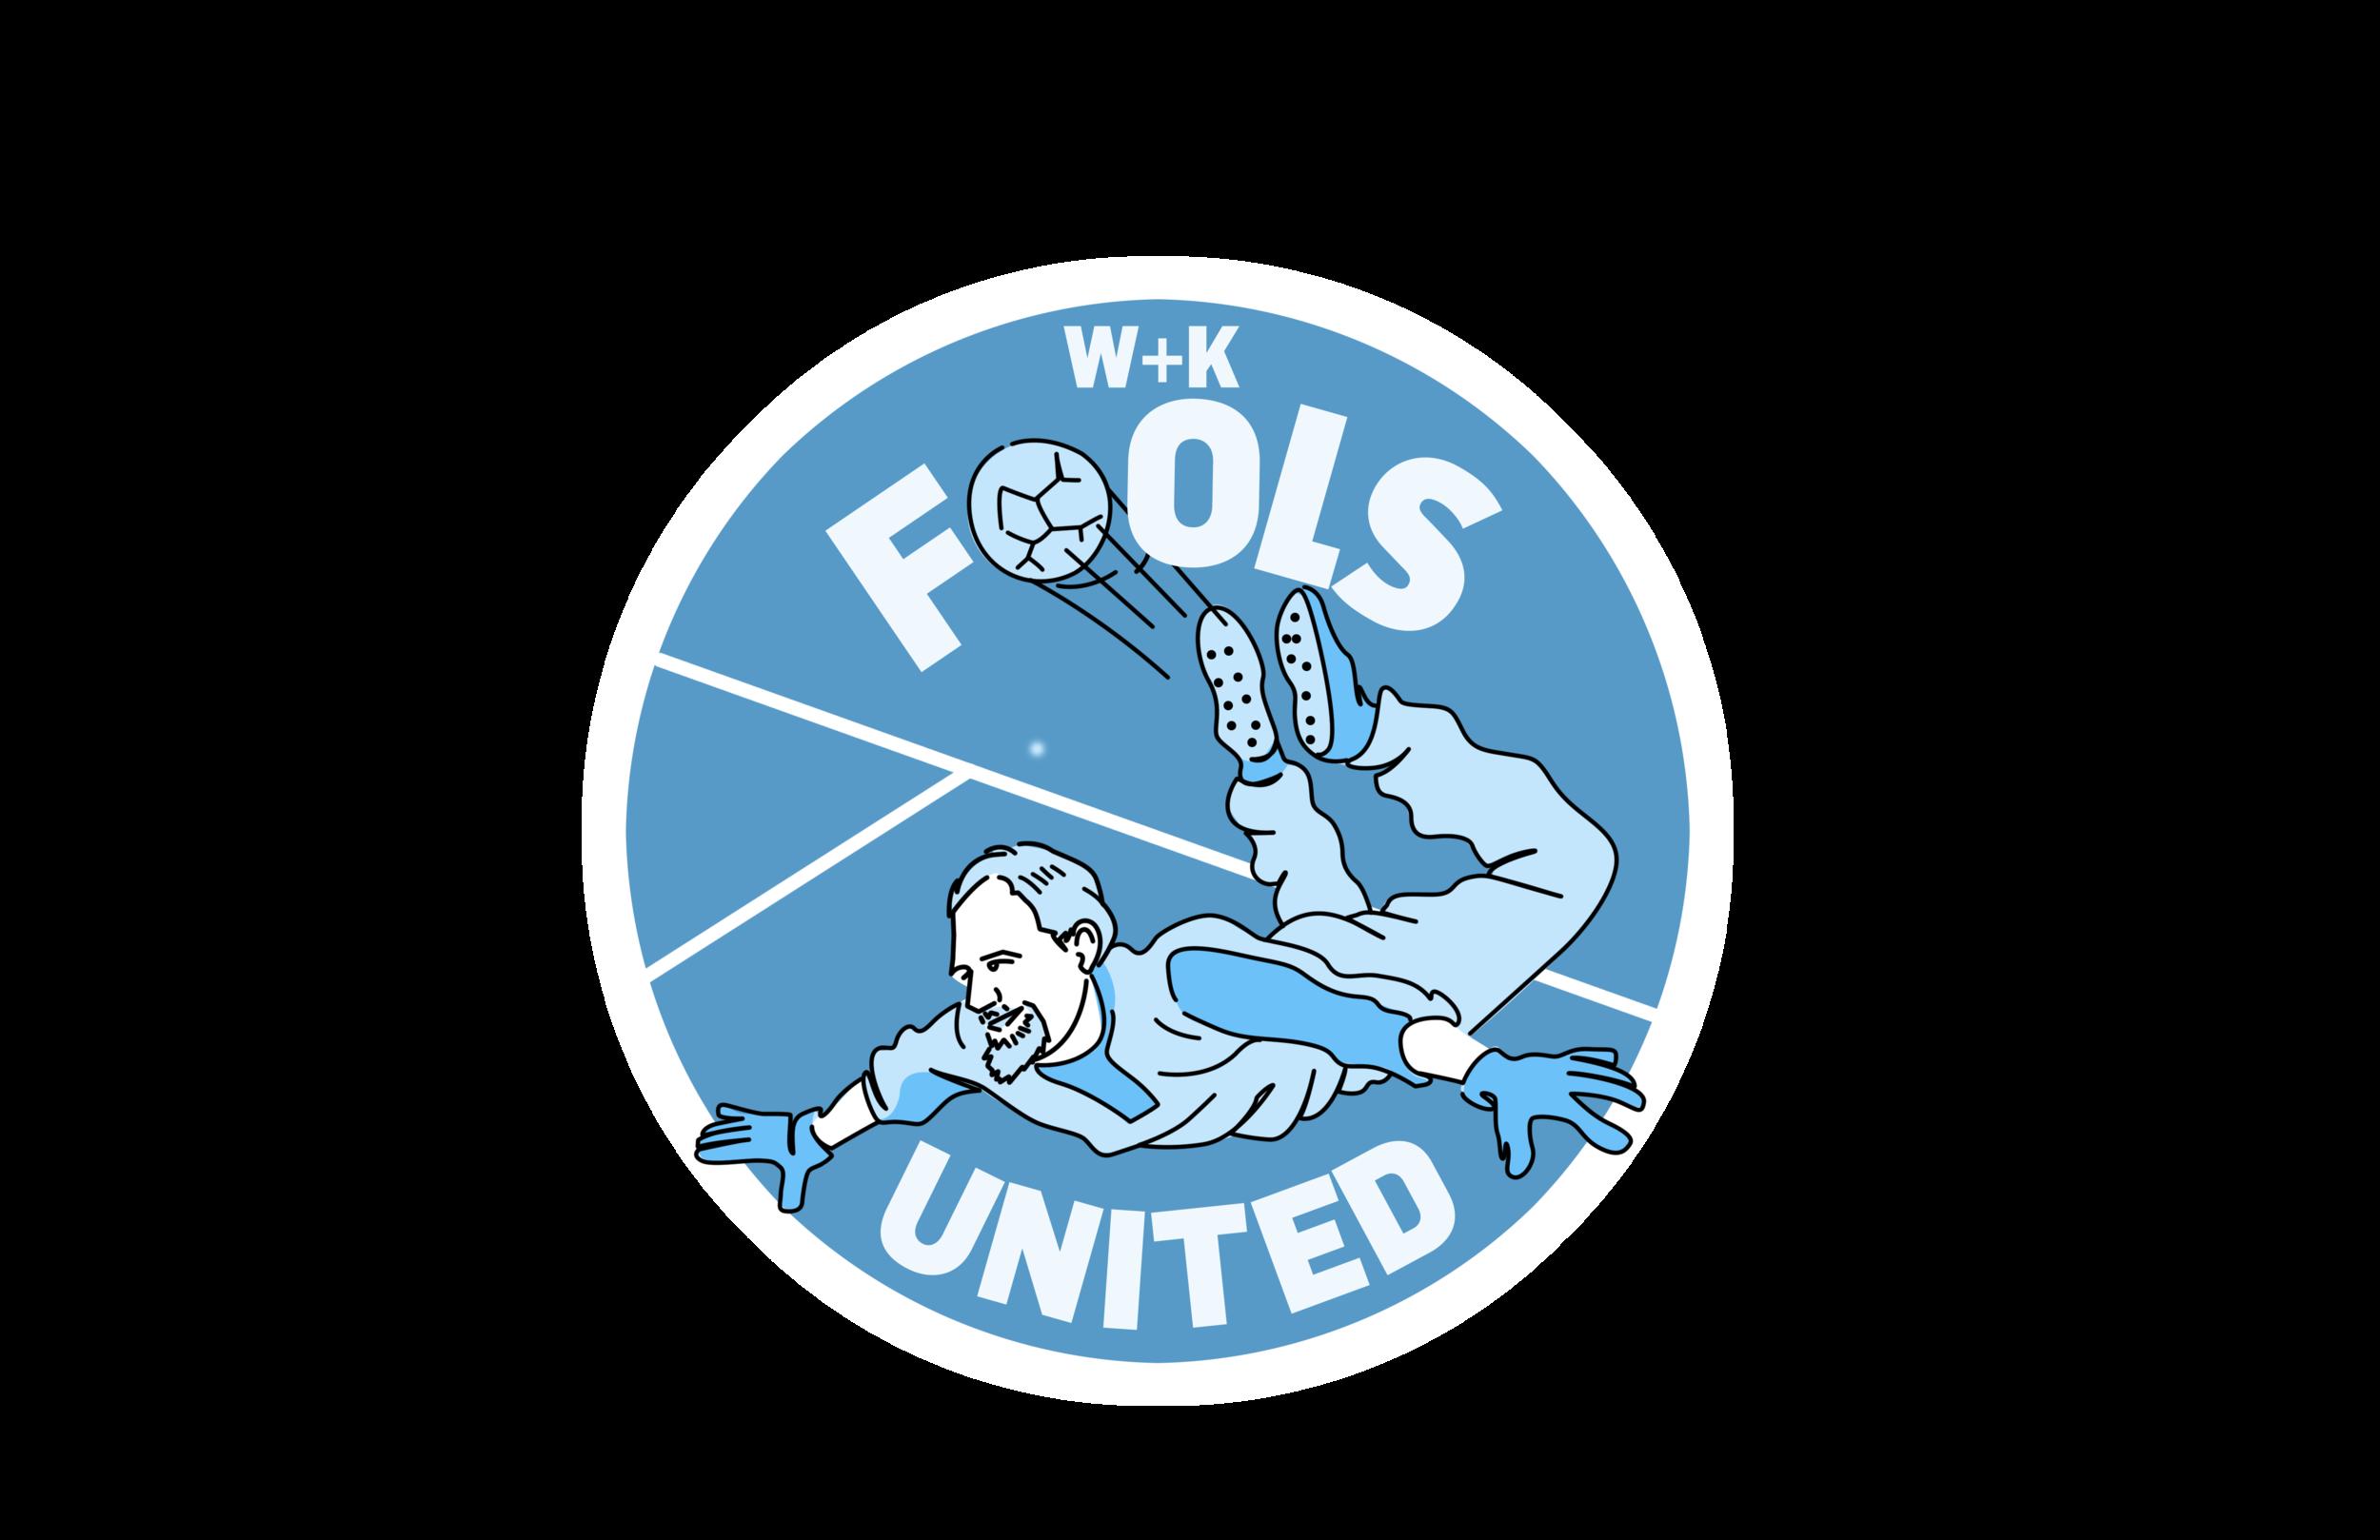 WKFools_2019_Toffee_Crest.png